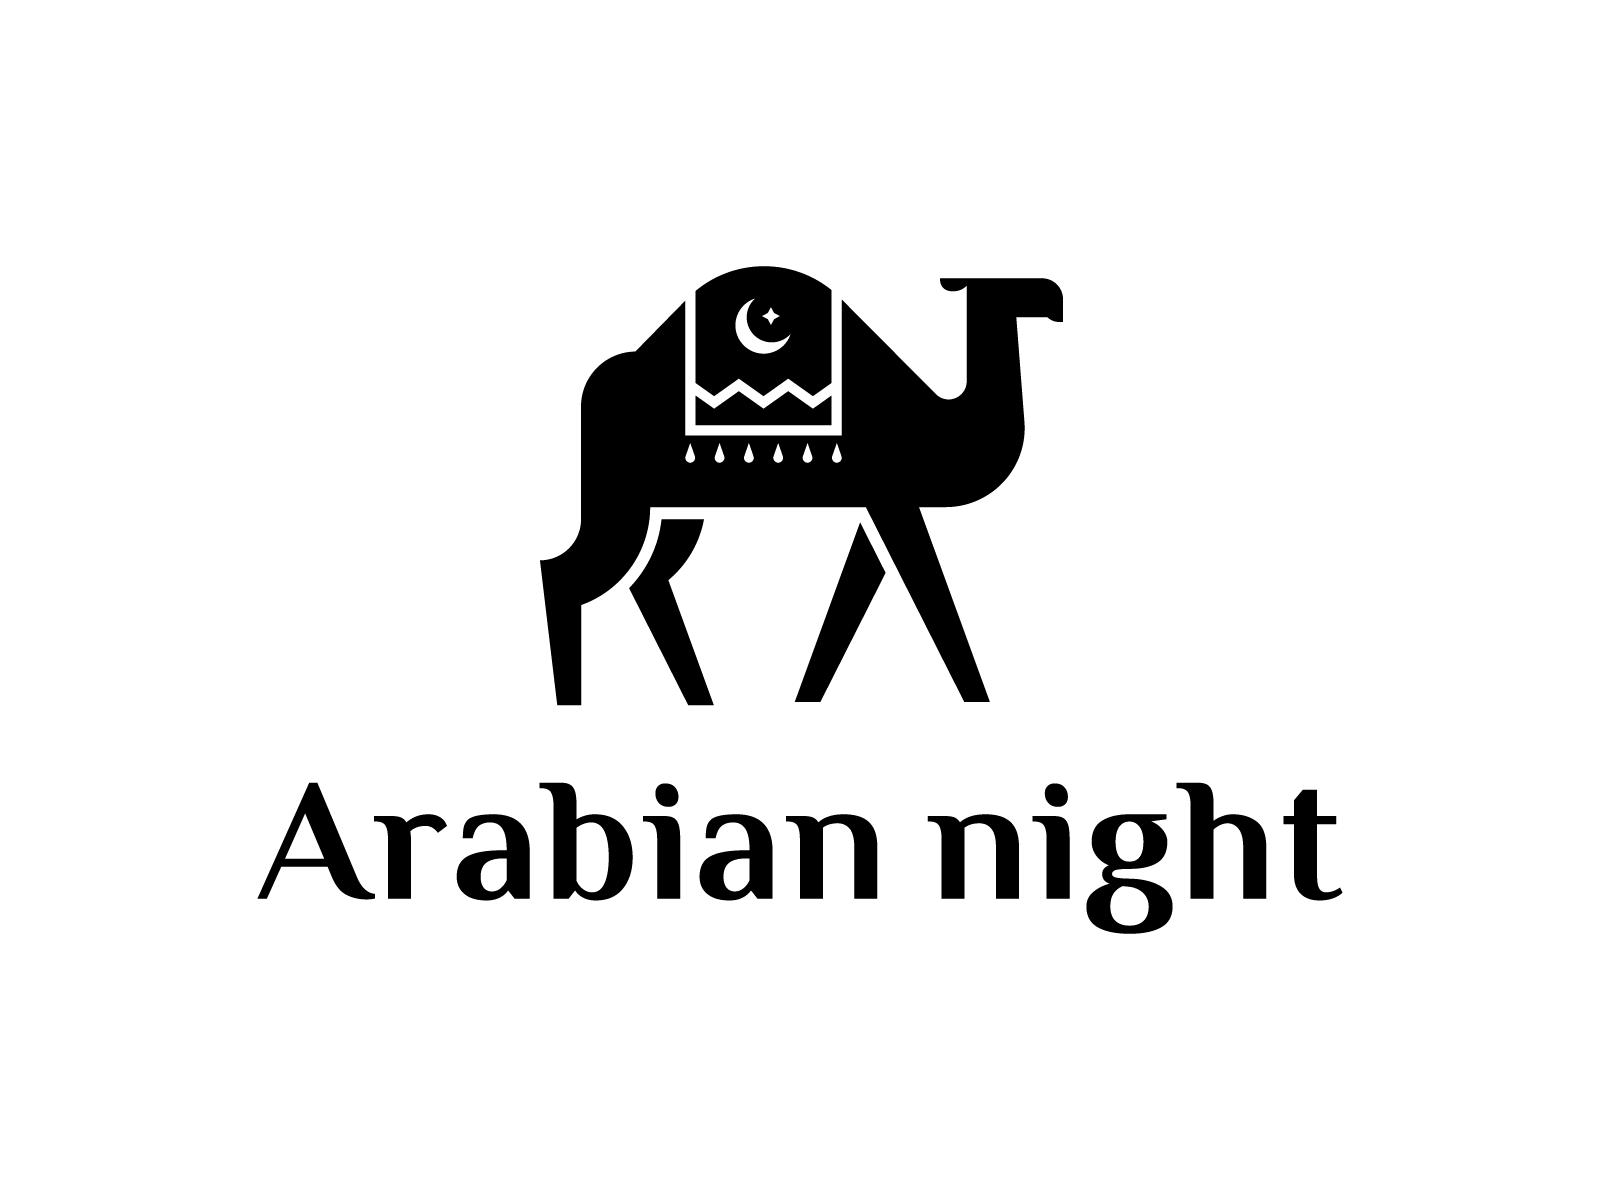 Арабская ночь